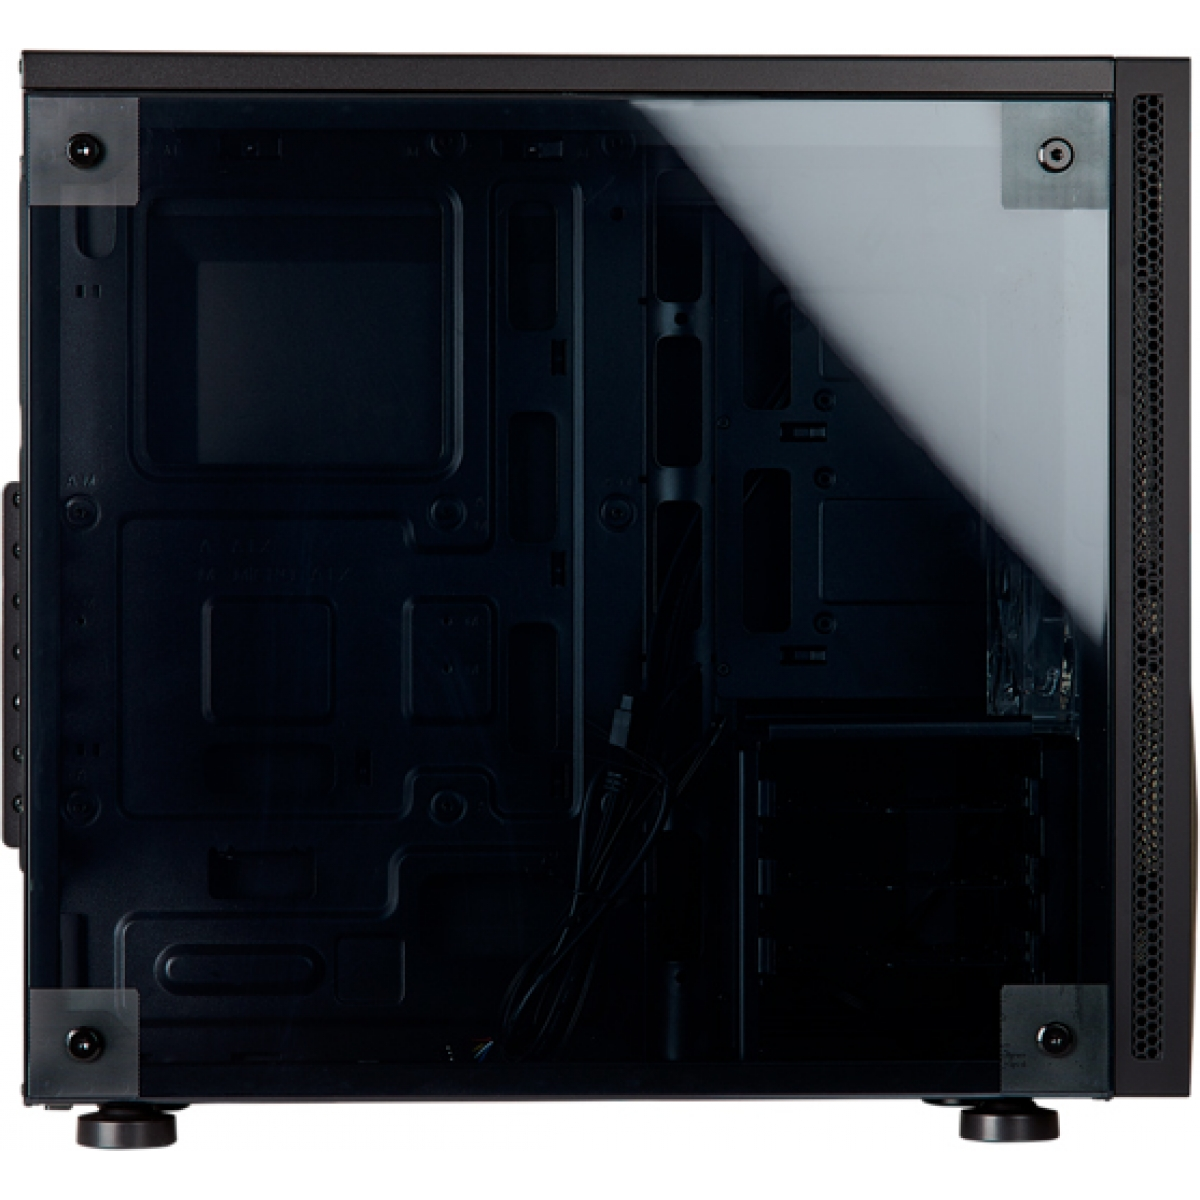 Gabinete Gamer Corsair Carbide SPEC-05, Mid Tower, Com 1 Fan, Lateral de Acrílico, Black, S-Fonte, CC-9011138-WW